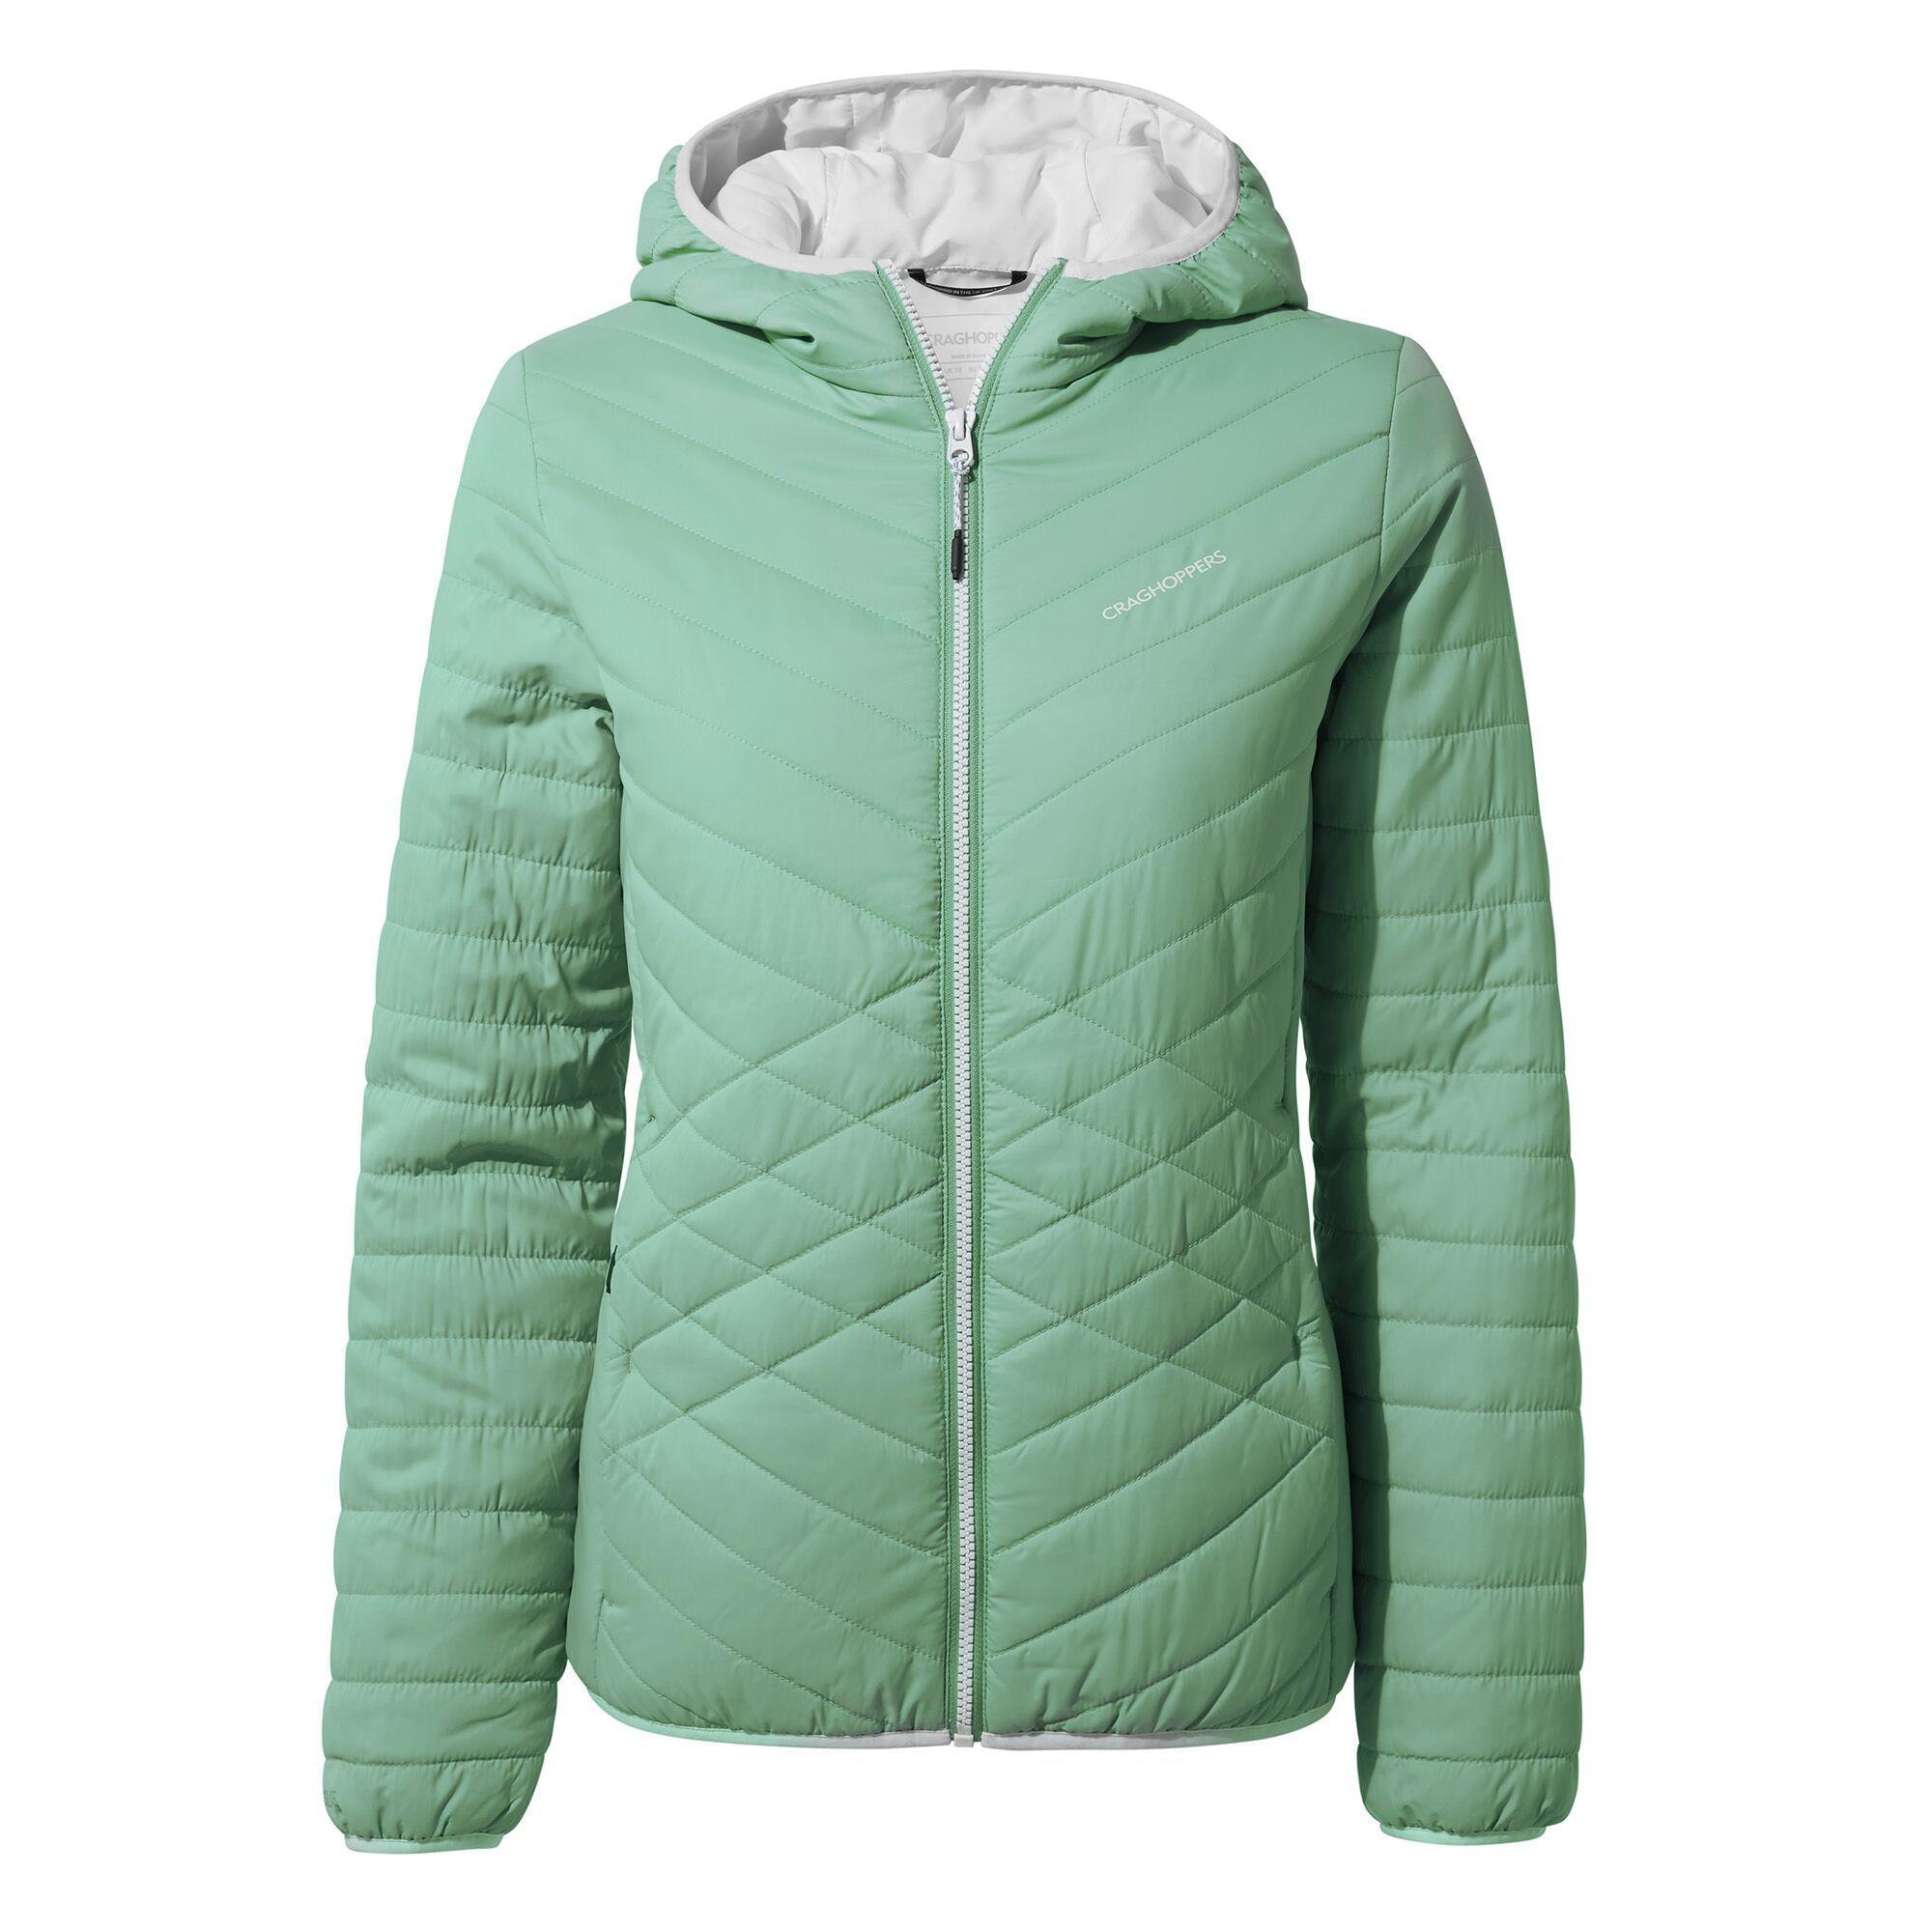 Craghoppers Womens/Ladies Compresslite IV Hooded Jacket (Sea Breeze)